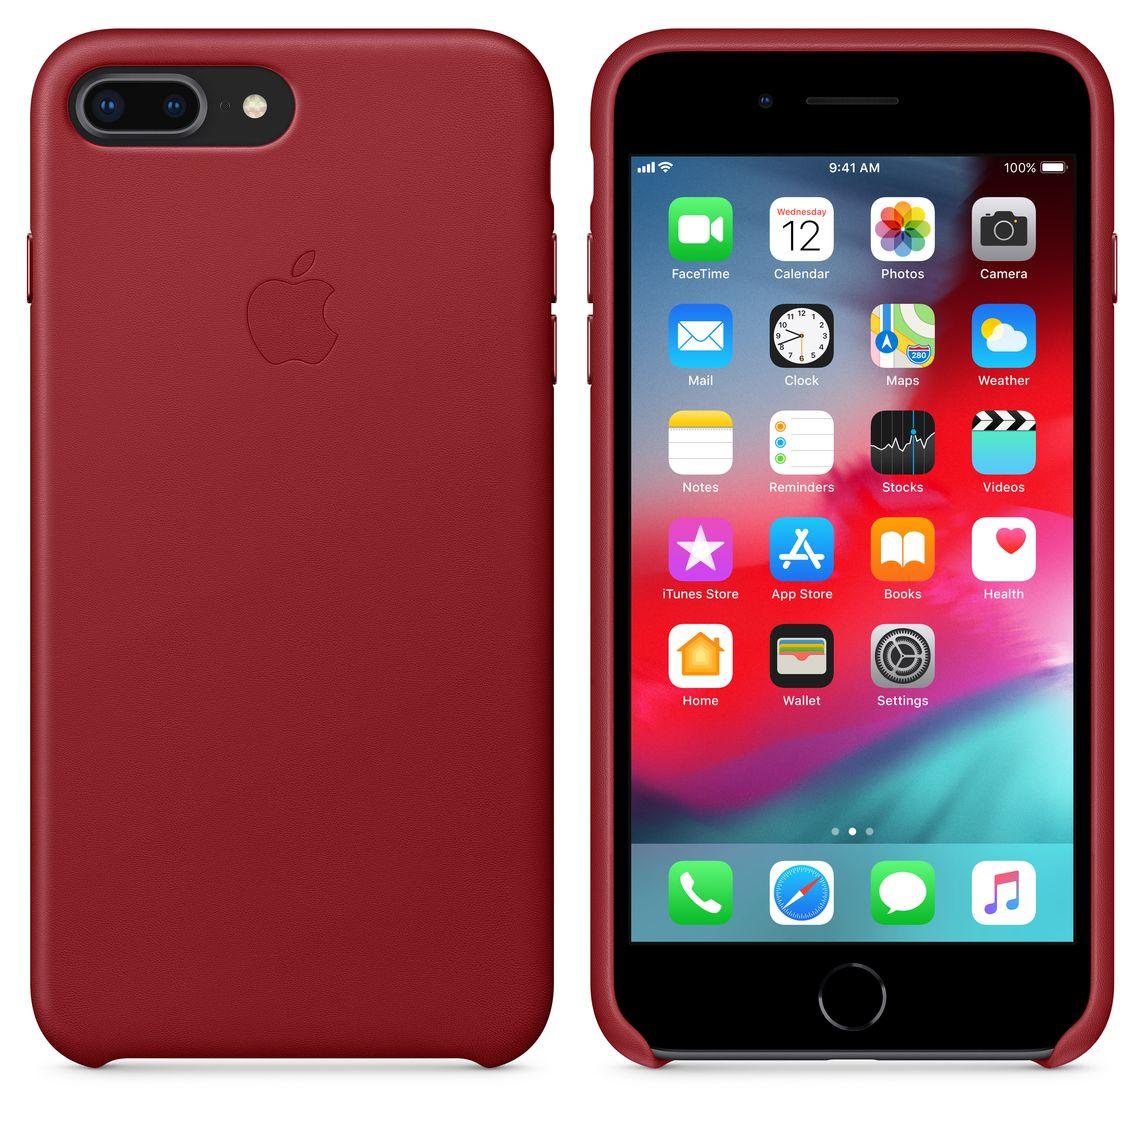 designer fashion 335c4 d37a2 iPhone 8 Plus / 7 Plus Leather Case - (PRODUCT)RED